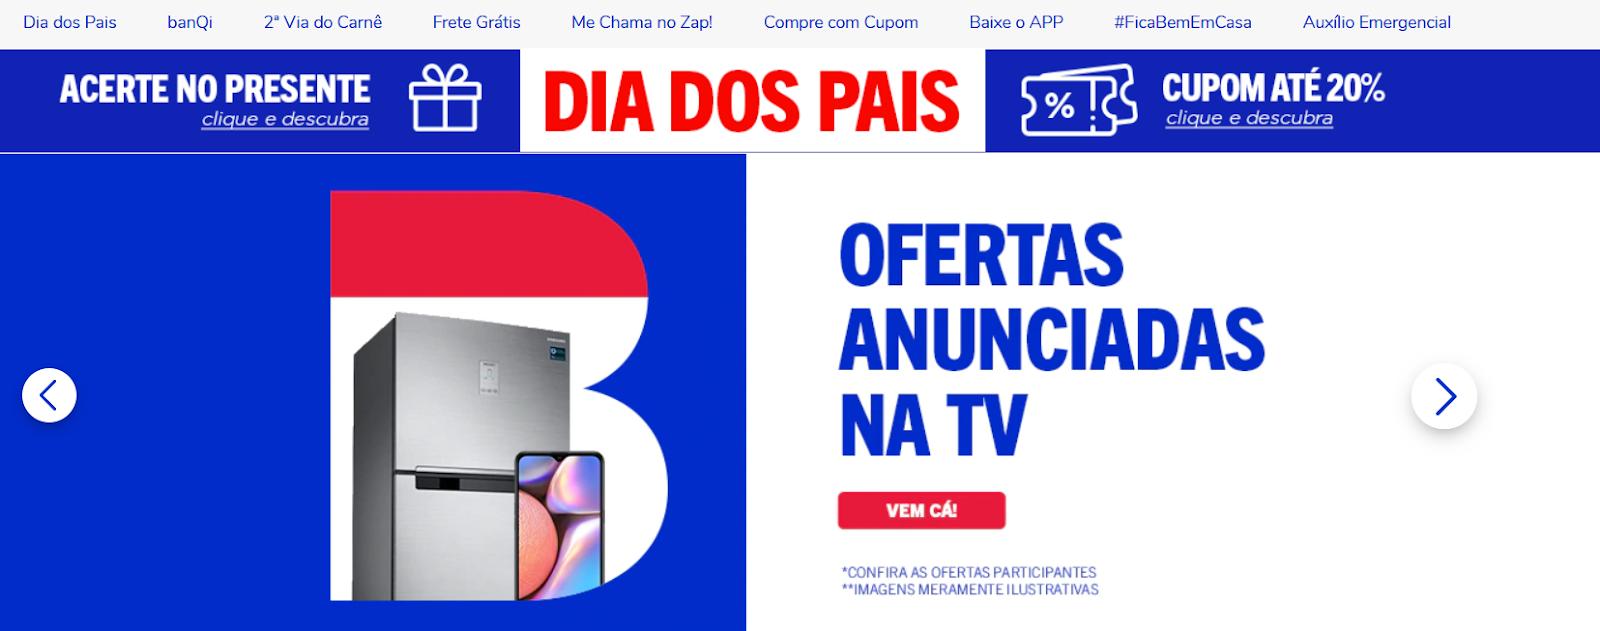 top e-commerce sites in Brazil casas bahia